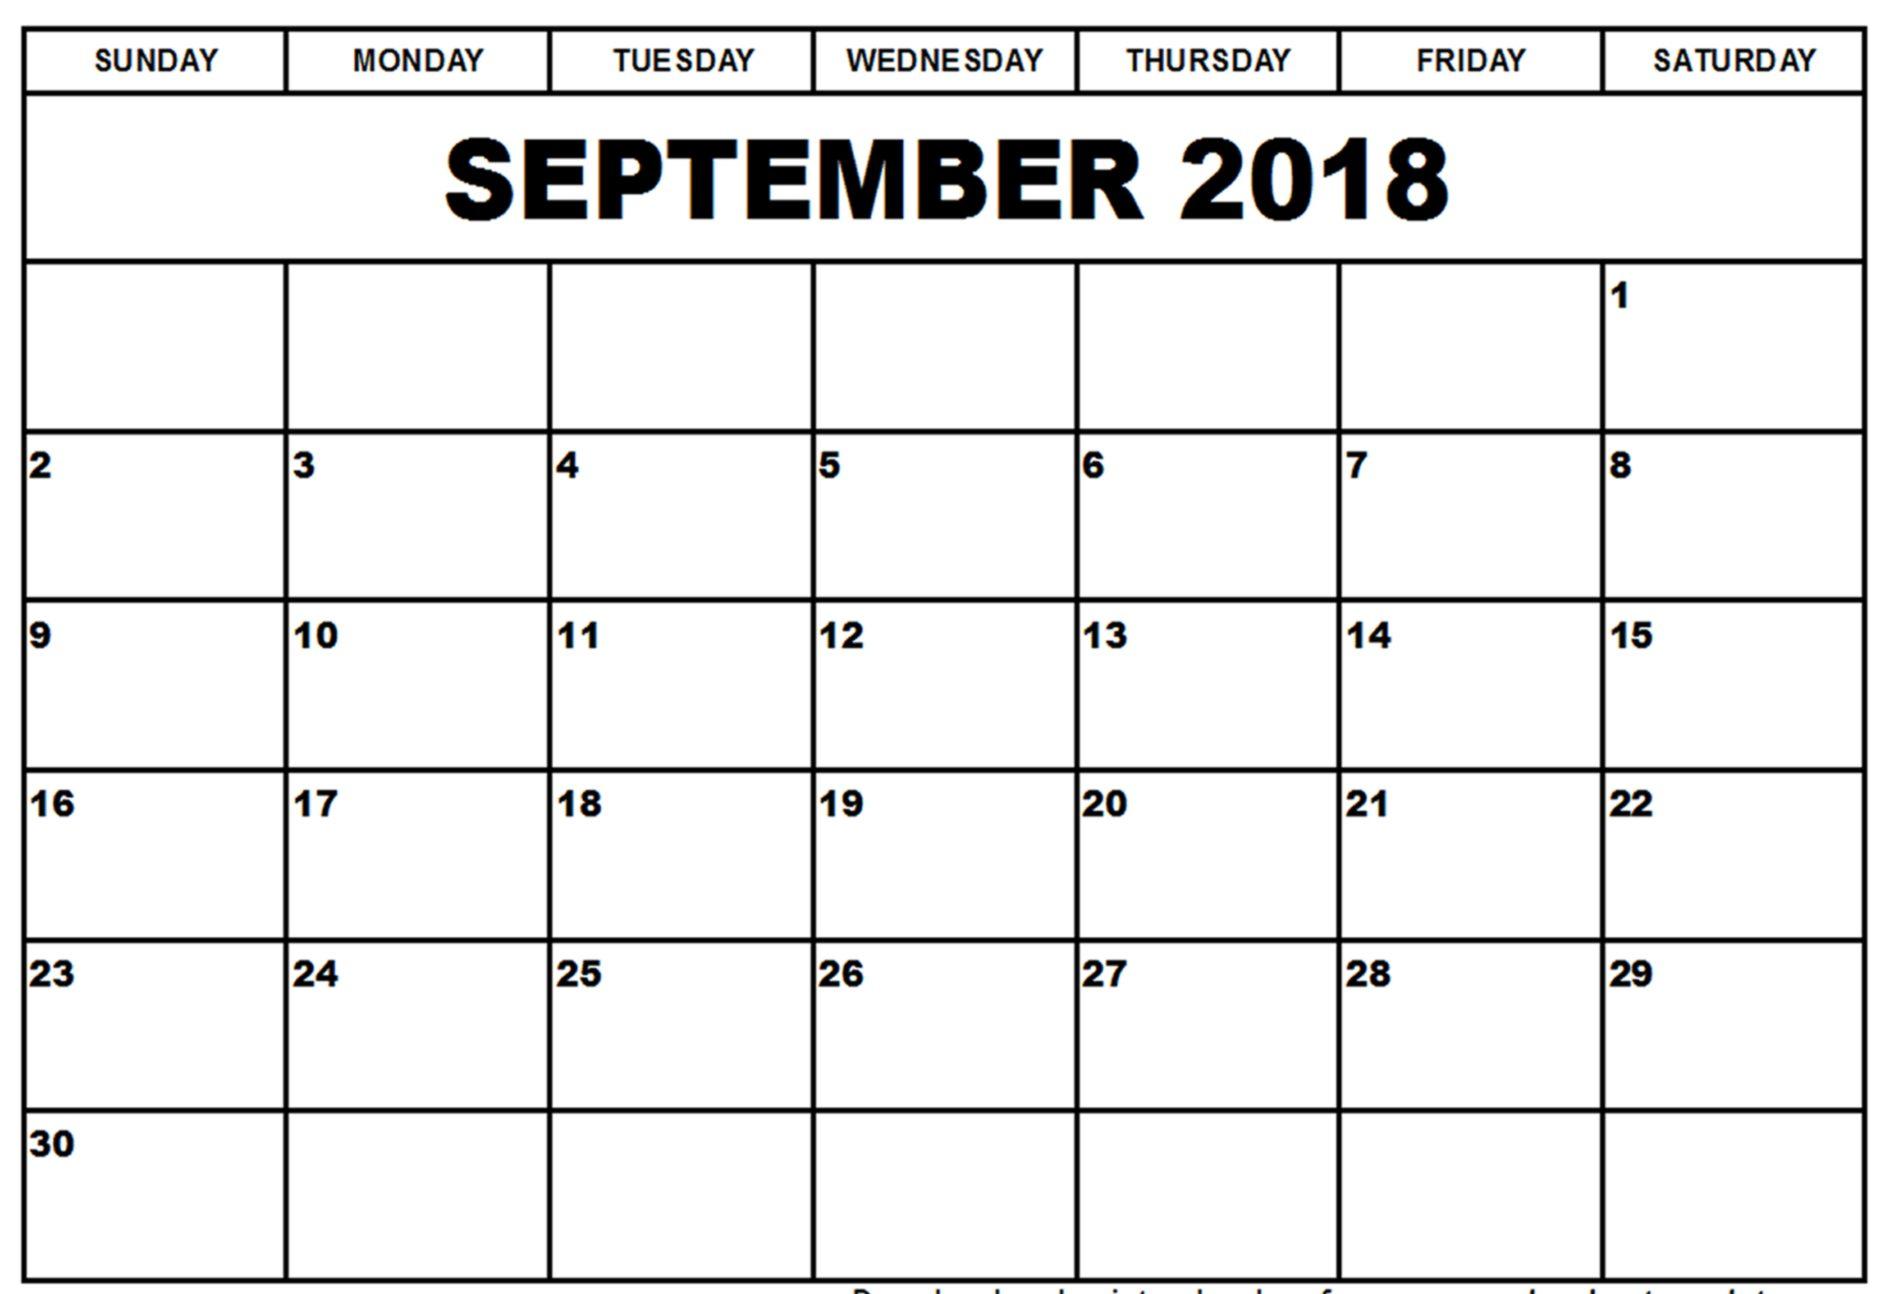 Printable Calendar September 2018 Template Pdf within Blank Calendars September Printable